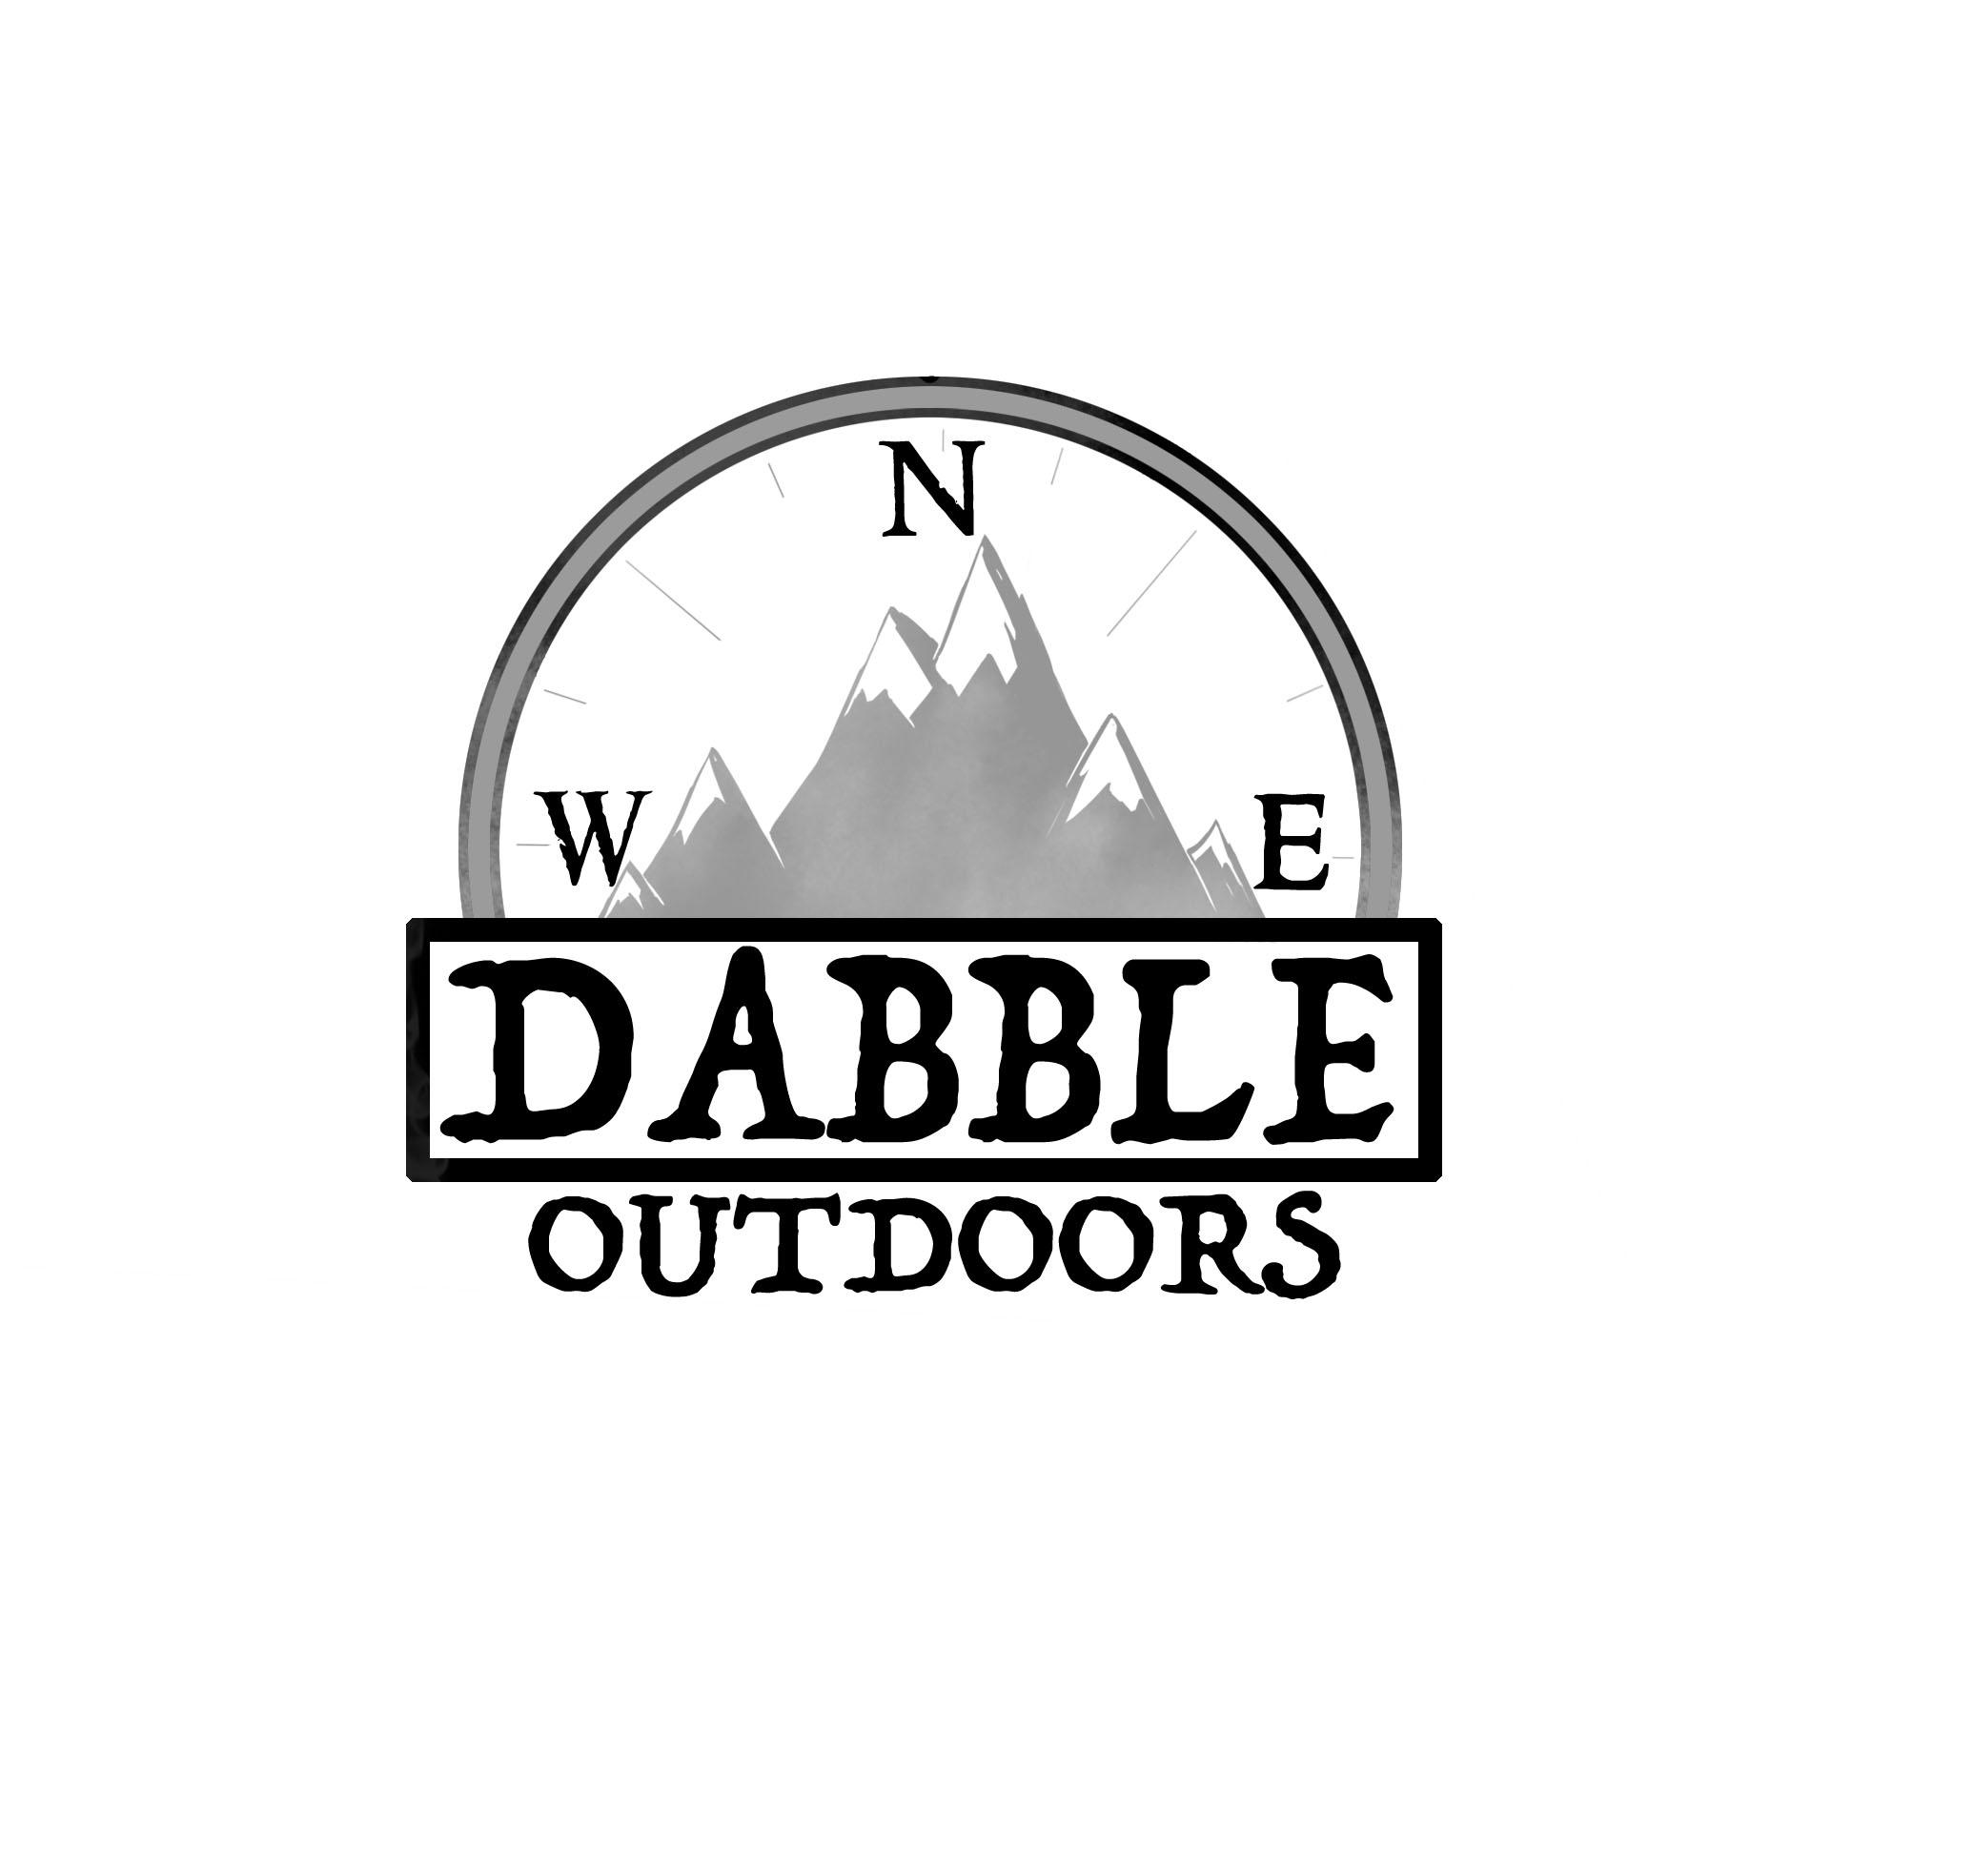 Outdoor equiment logo